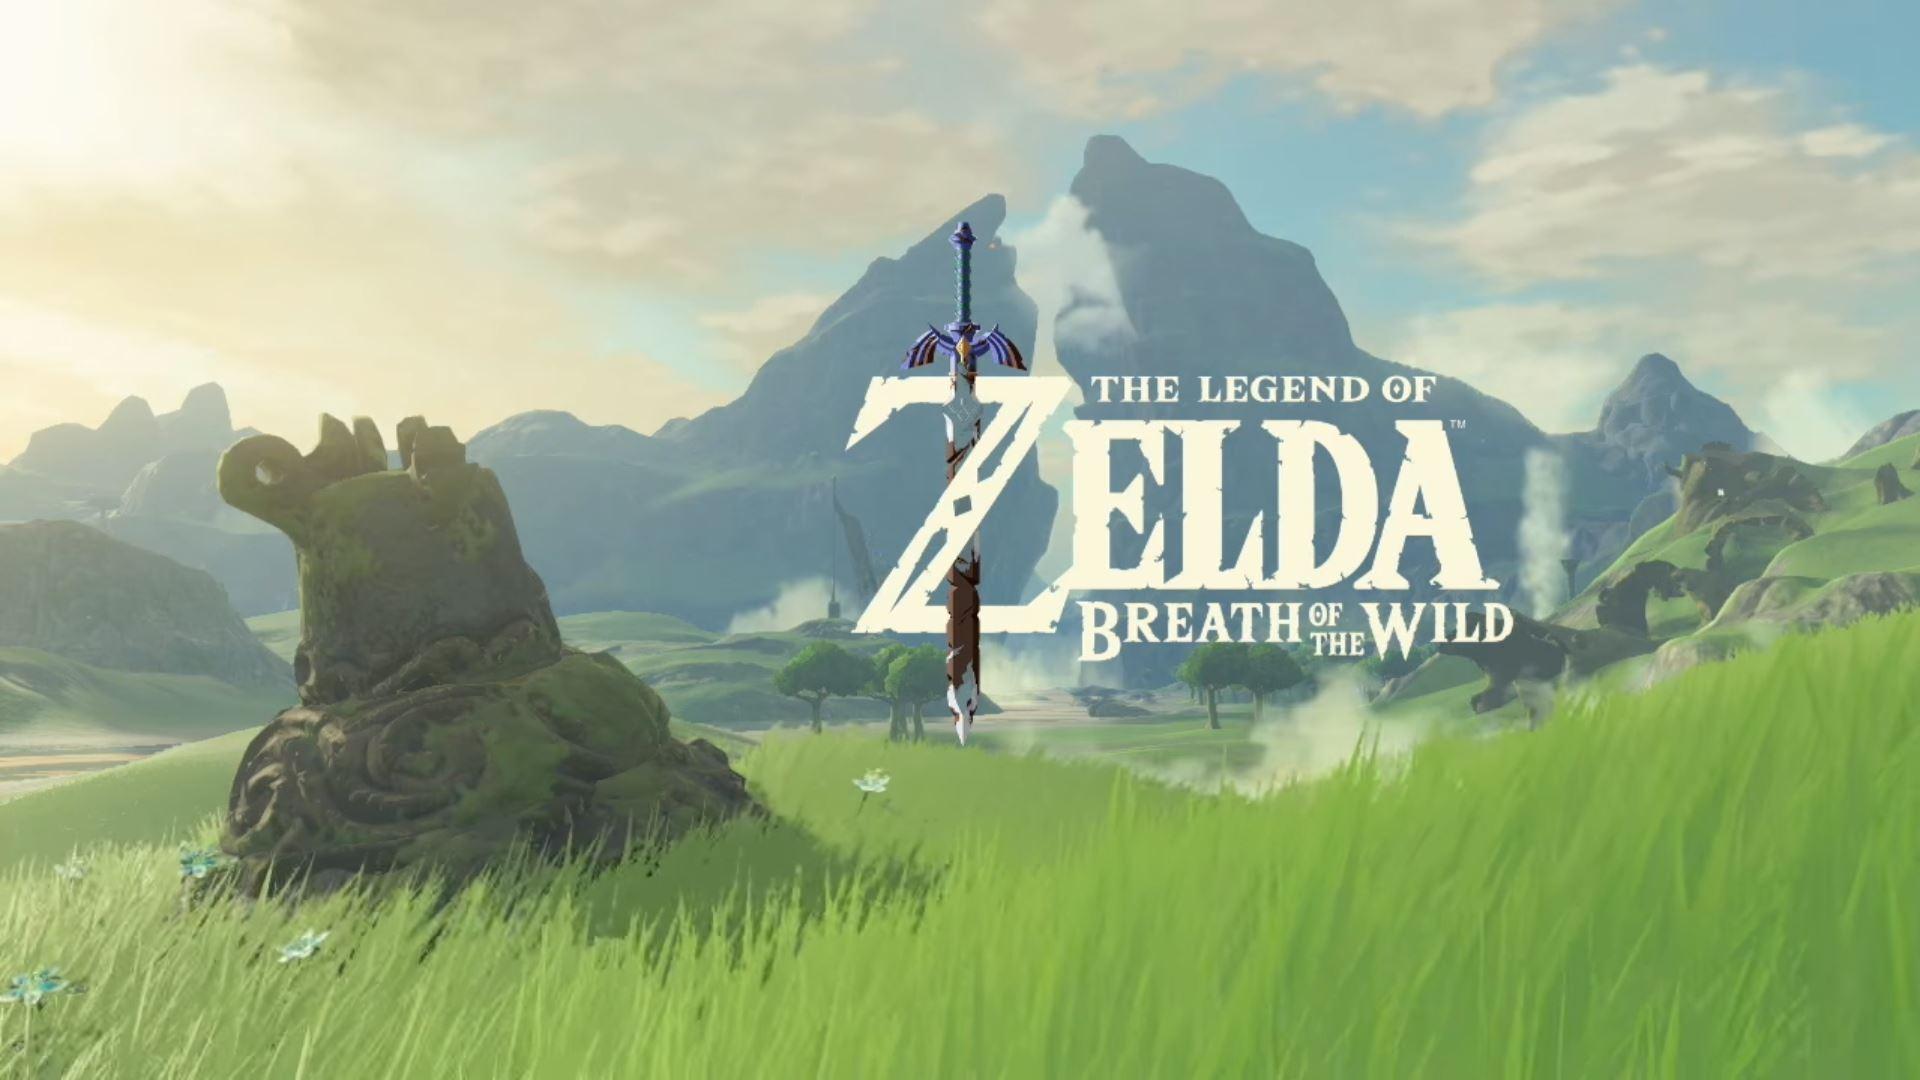 The Legend of Zelda: Breath of the Wild Reveals Delay Reasoning